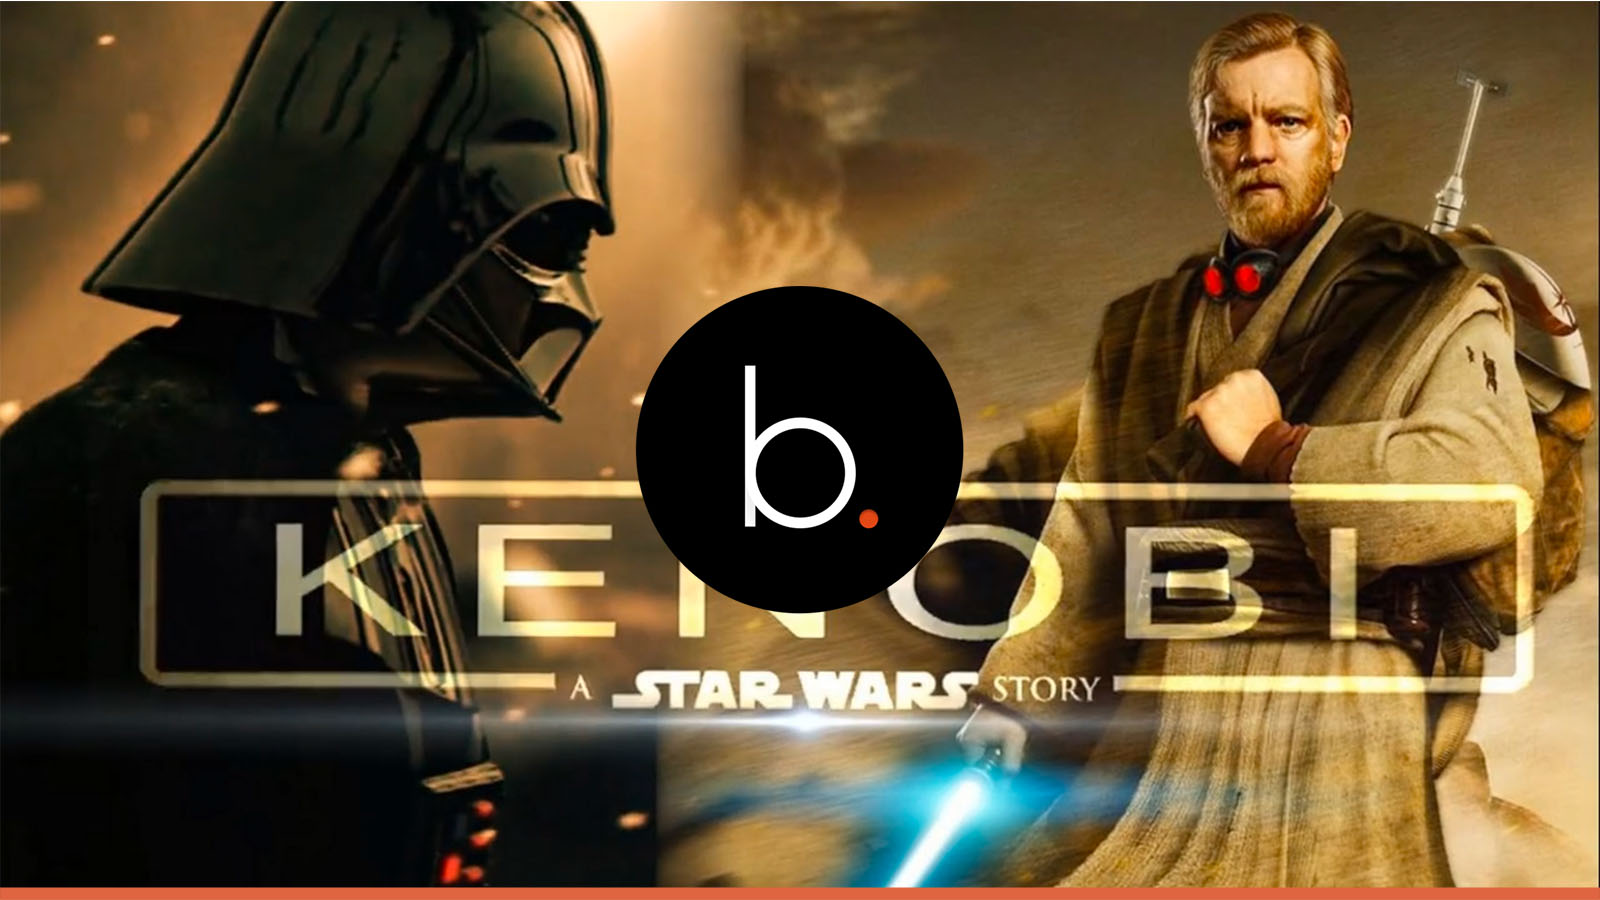 Star Wars : Ewan McGregor de retour dans le spin-off sur Obi-Wan Kenobi ?